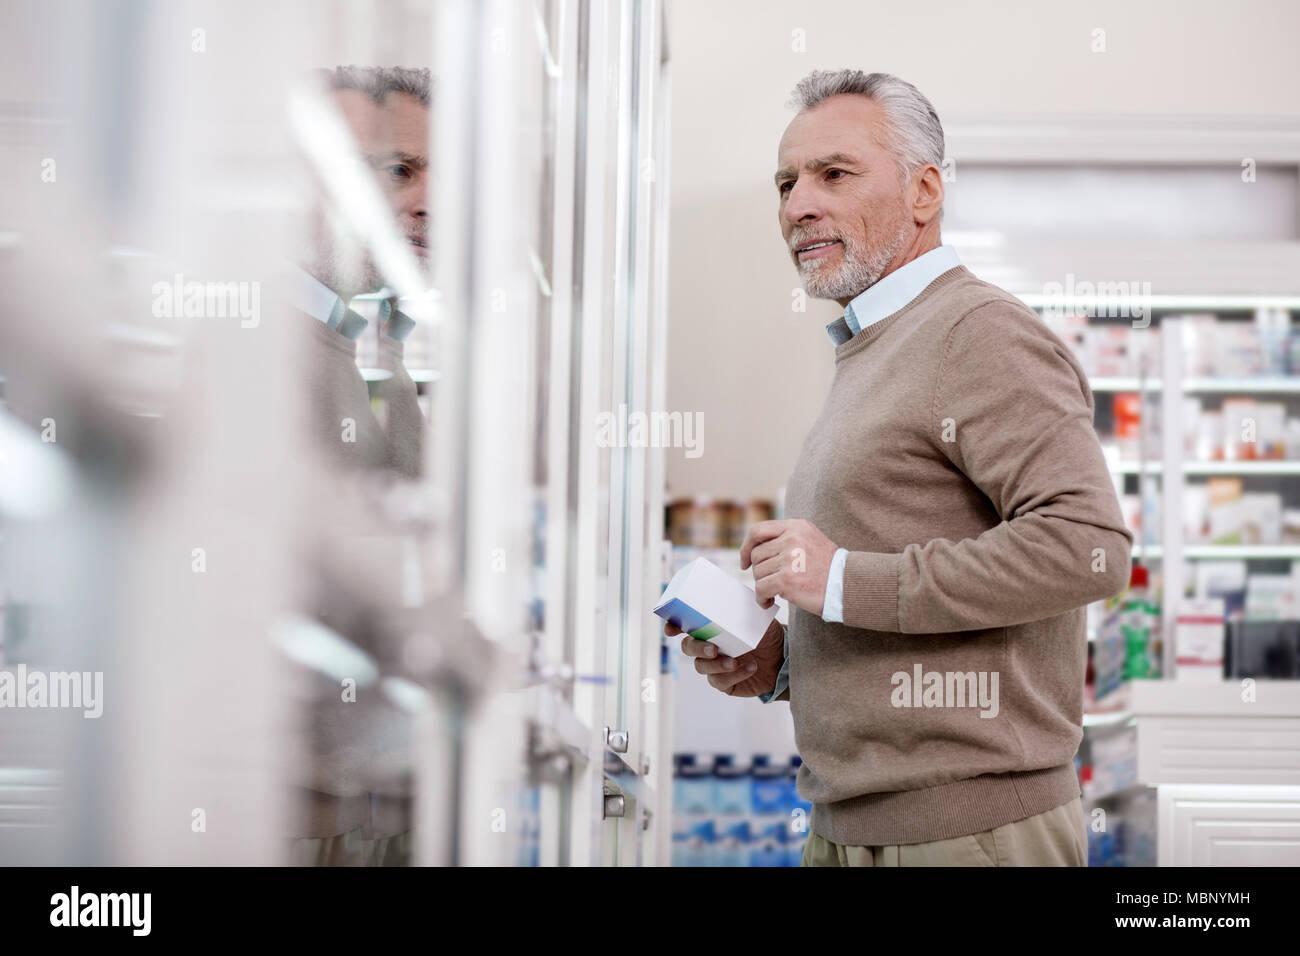 Thoughtful senior man selecting vitamins - Stock Image